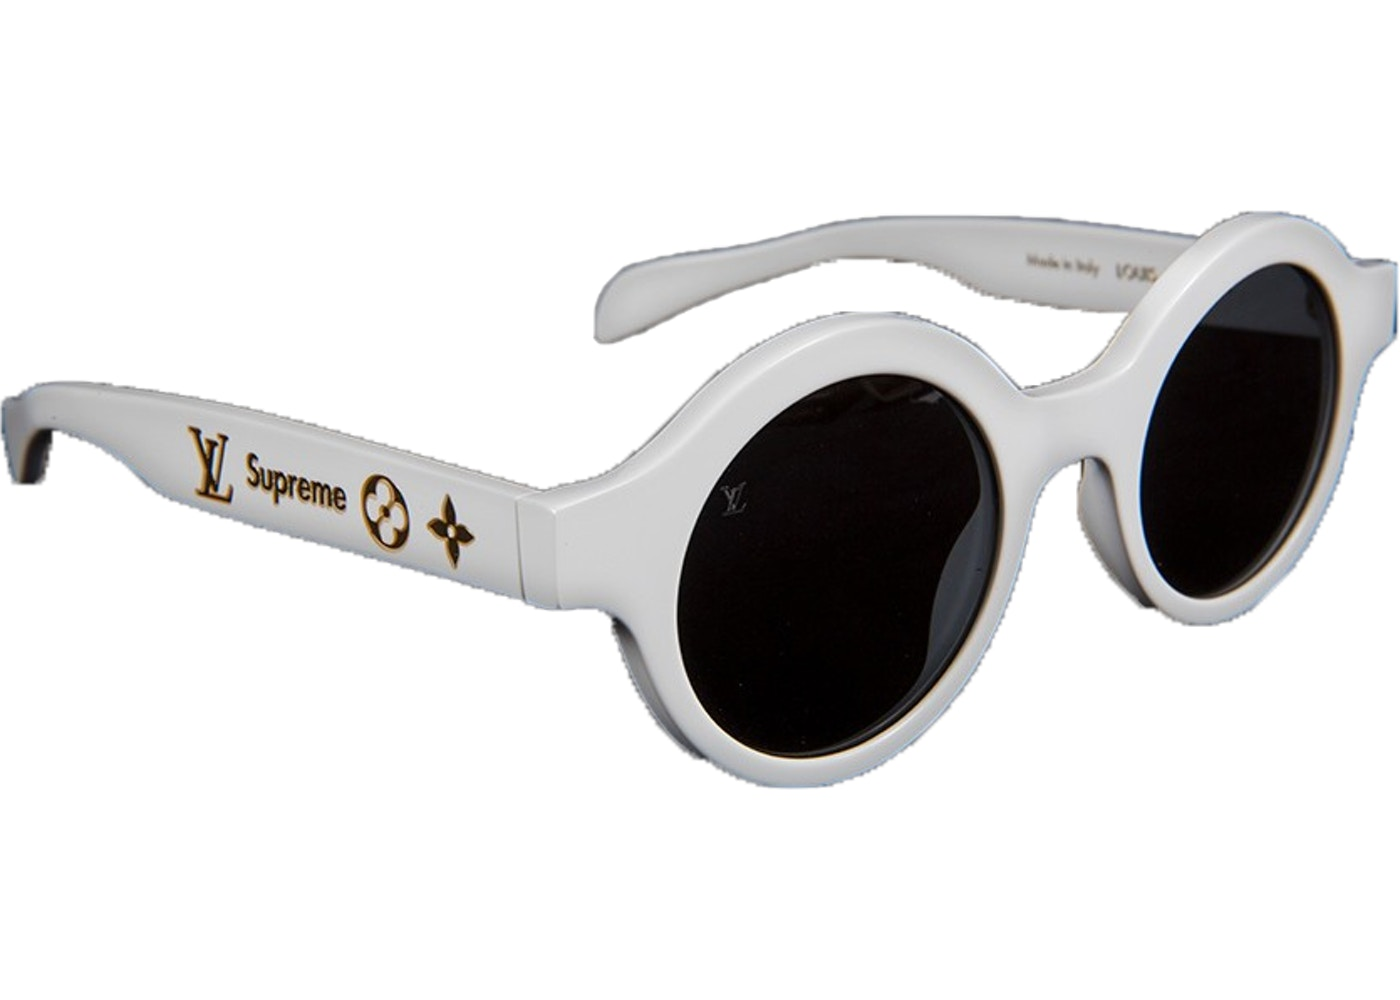 aebecf308ed15 Streetwear - Supreme Accessories - Last Sale